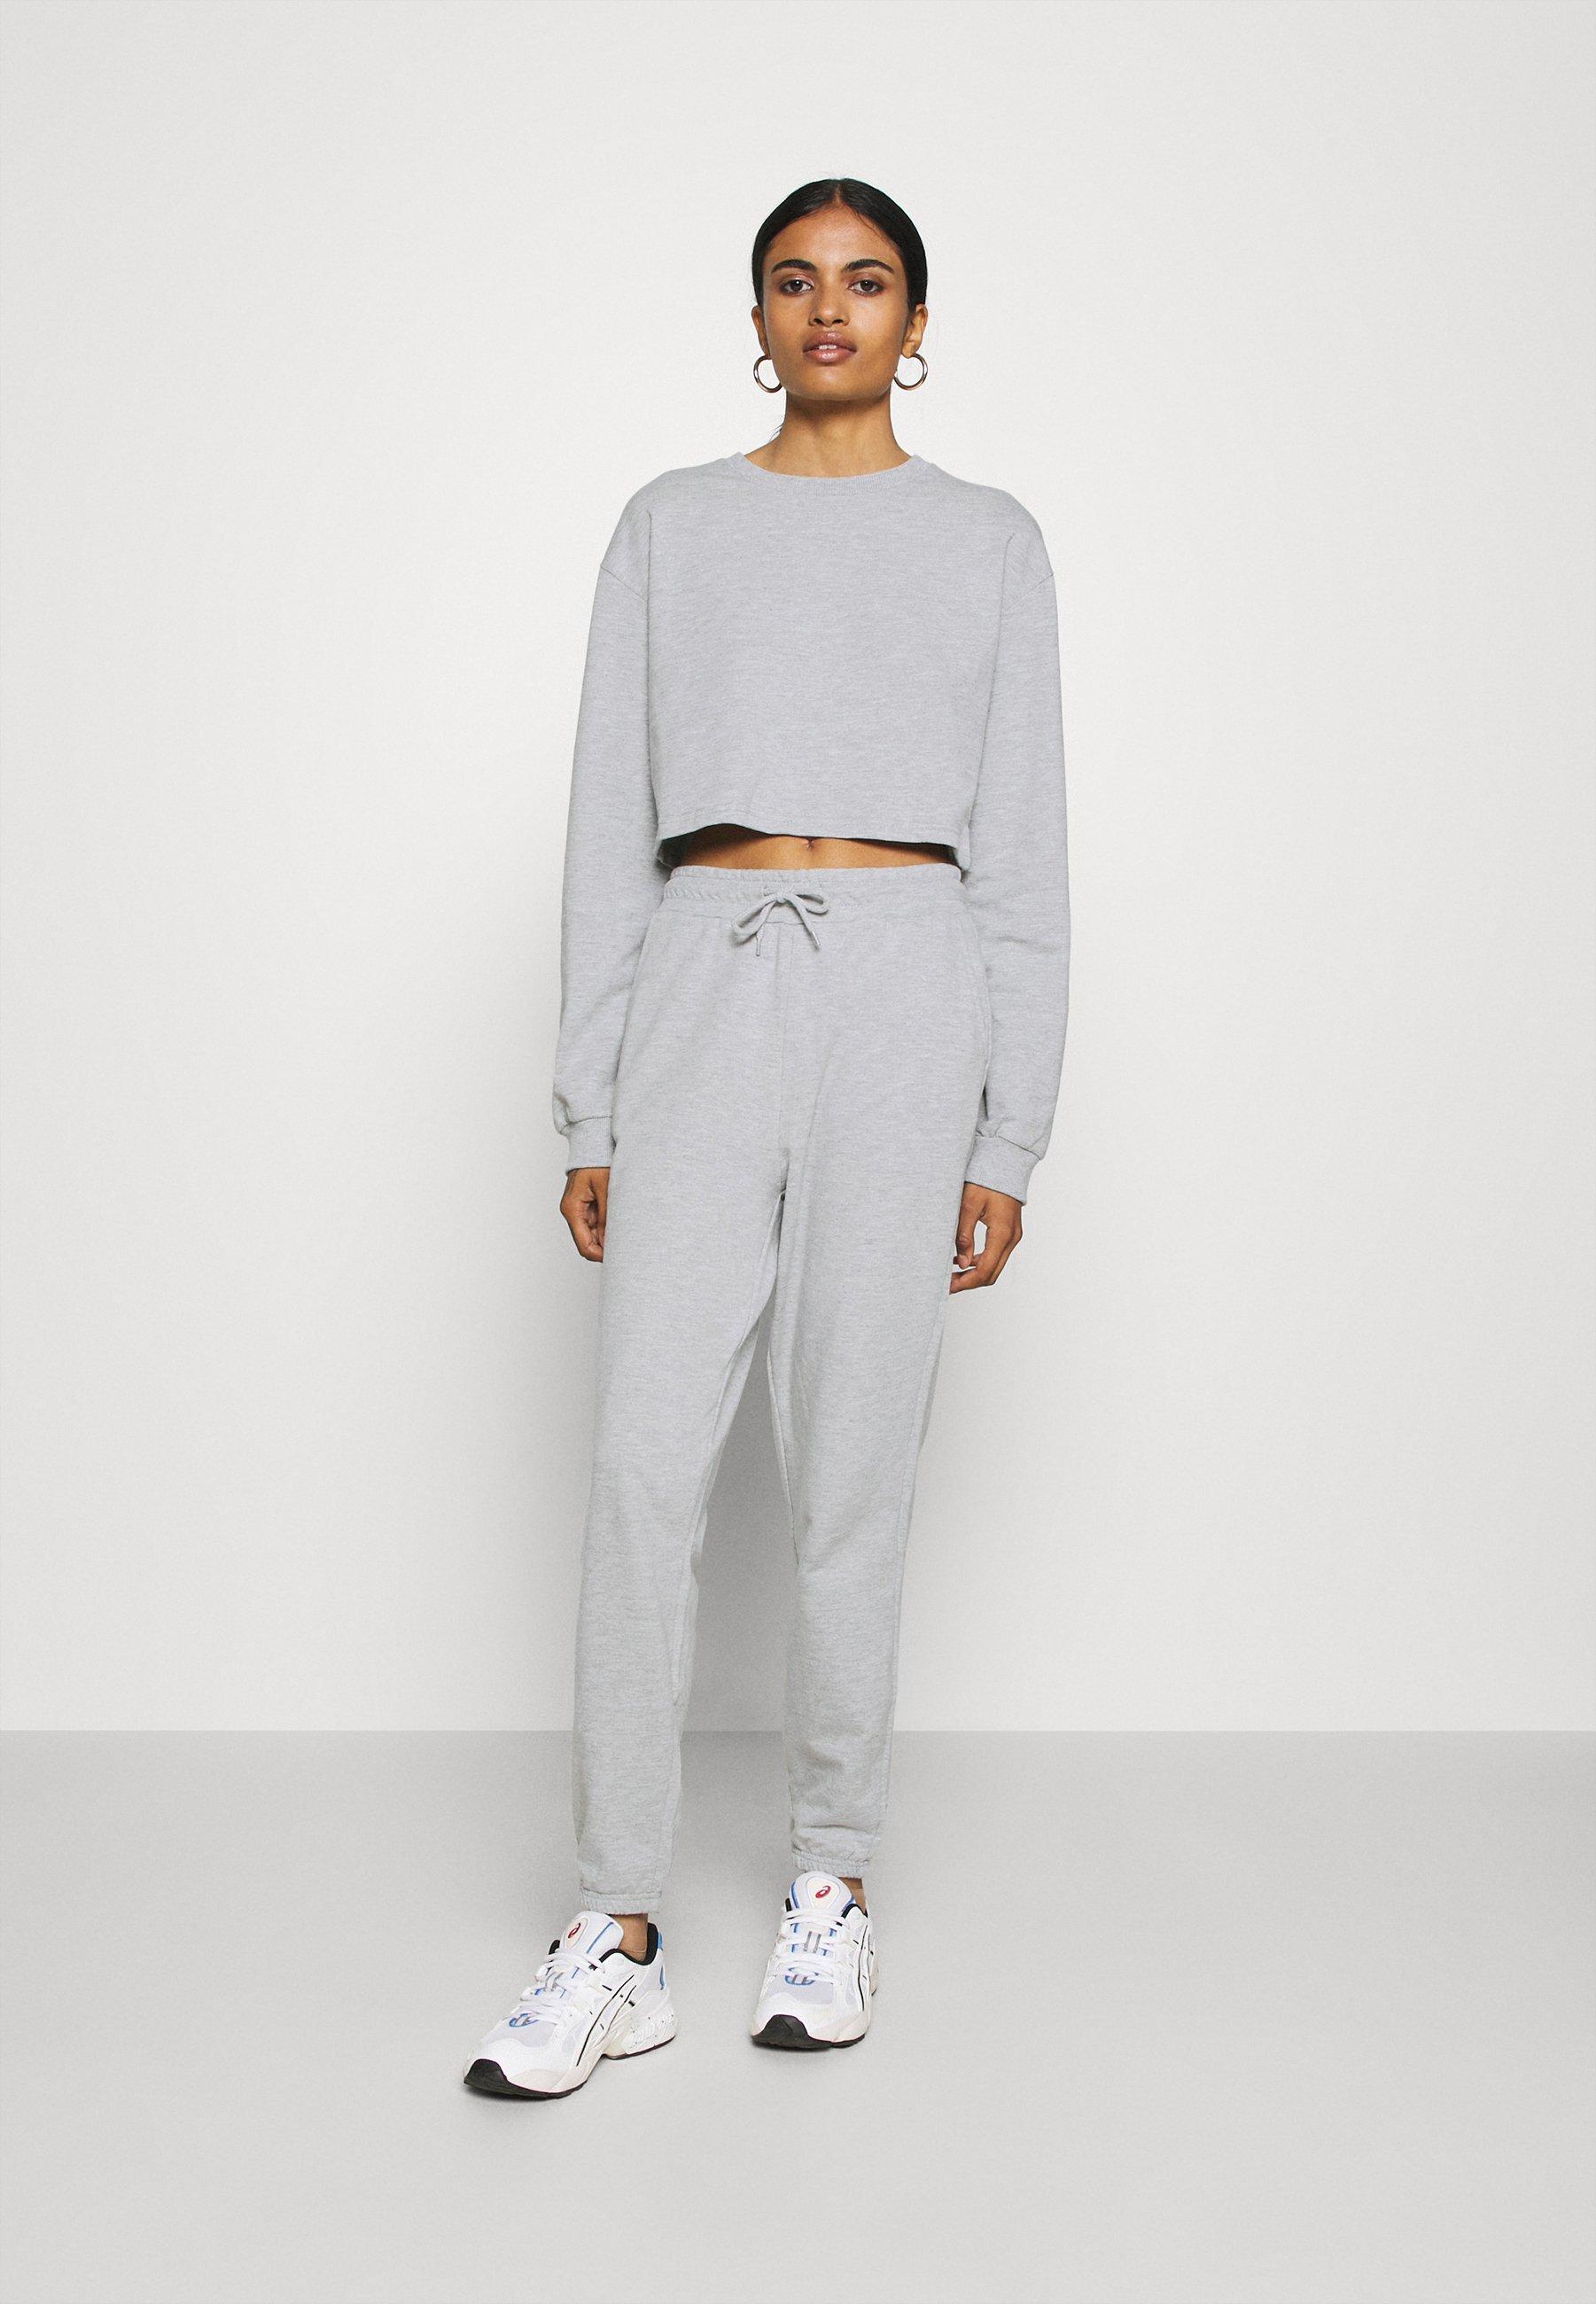 Damen SWEAT SET CROPPED SWEATSHIRT & LOOSE JOGGER - Sweatshirt